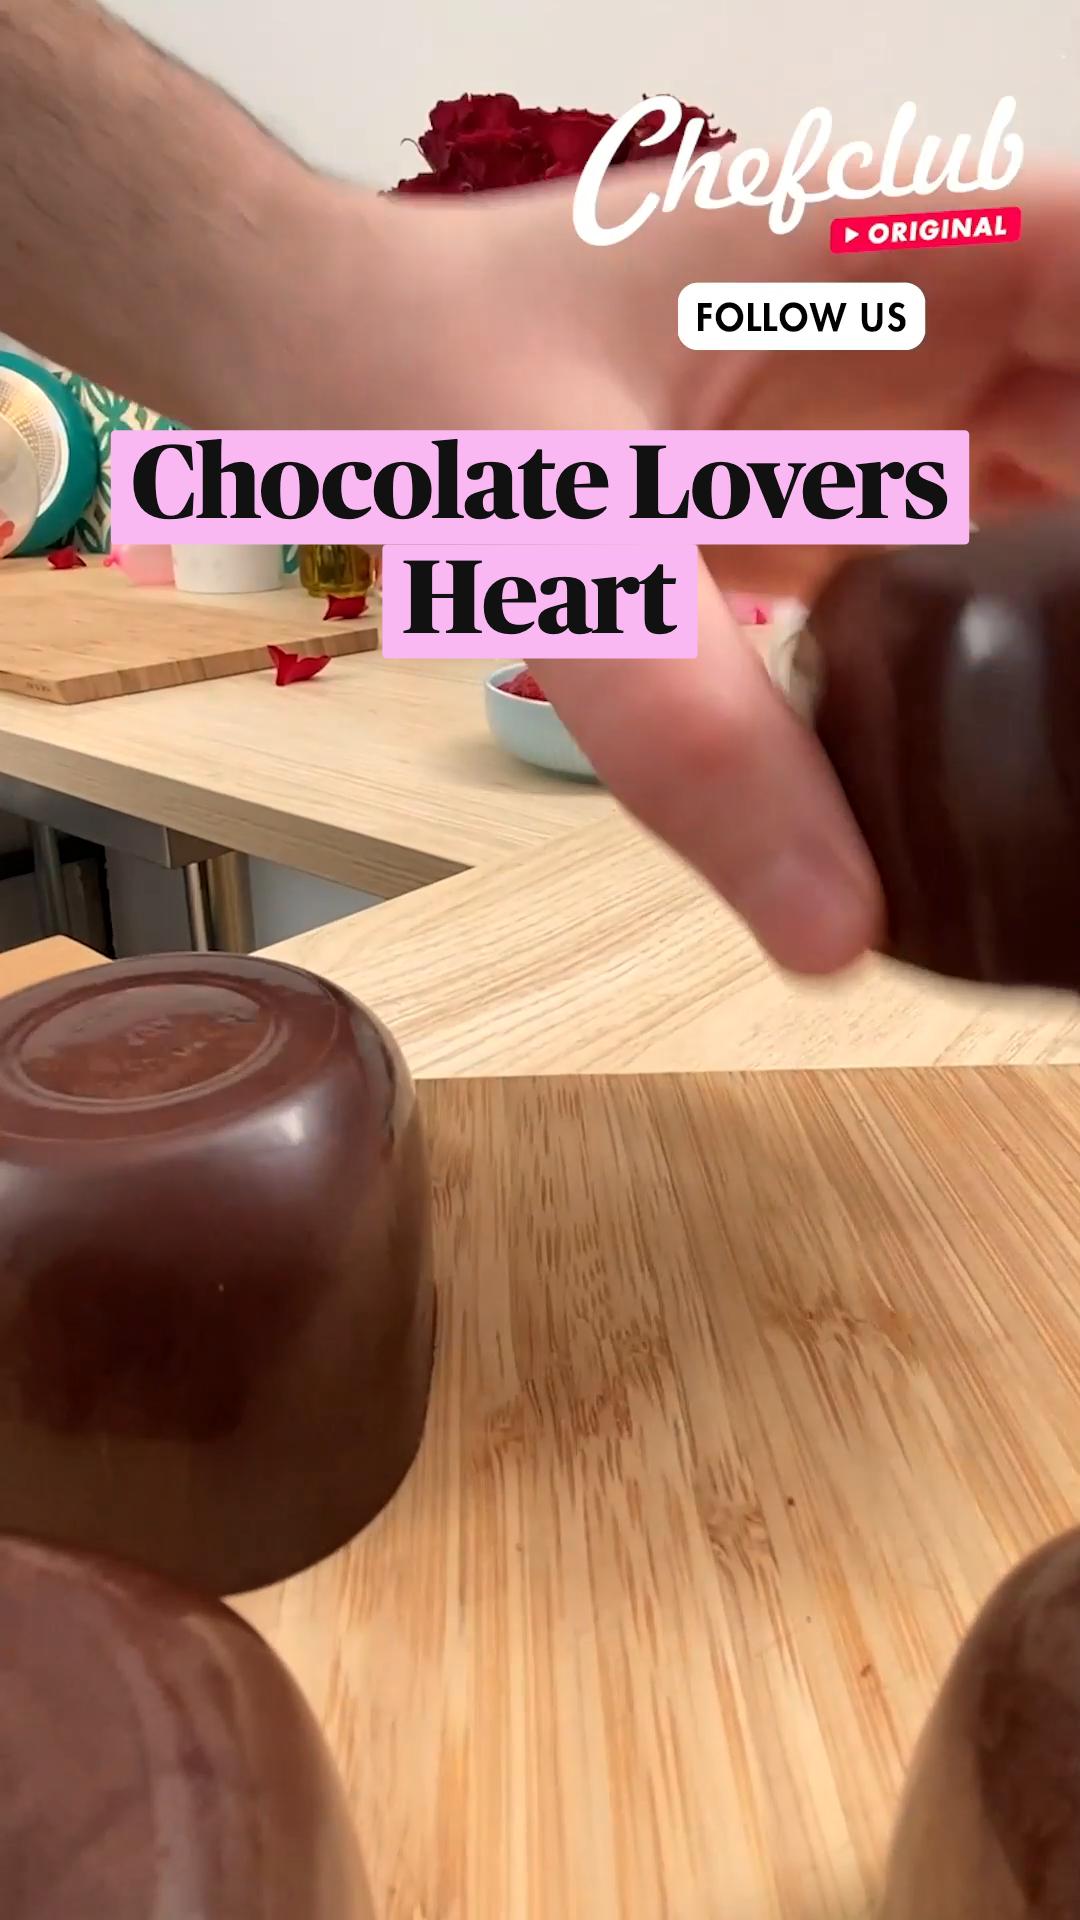 Chocolate Lovers Heart